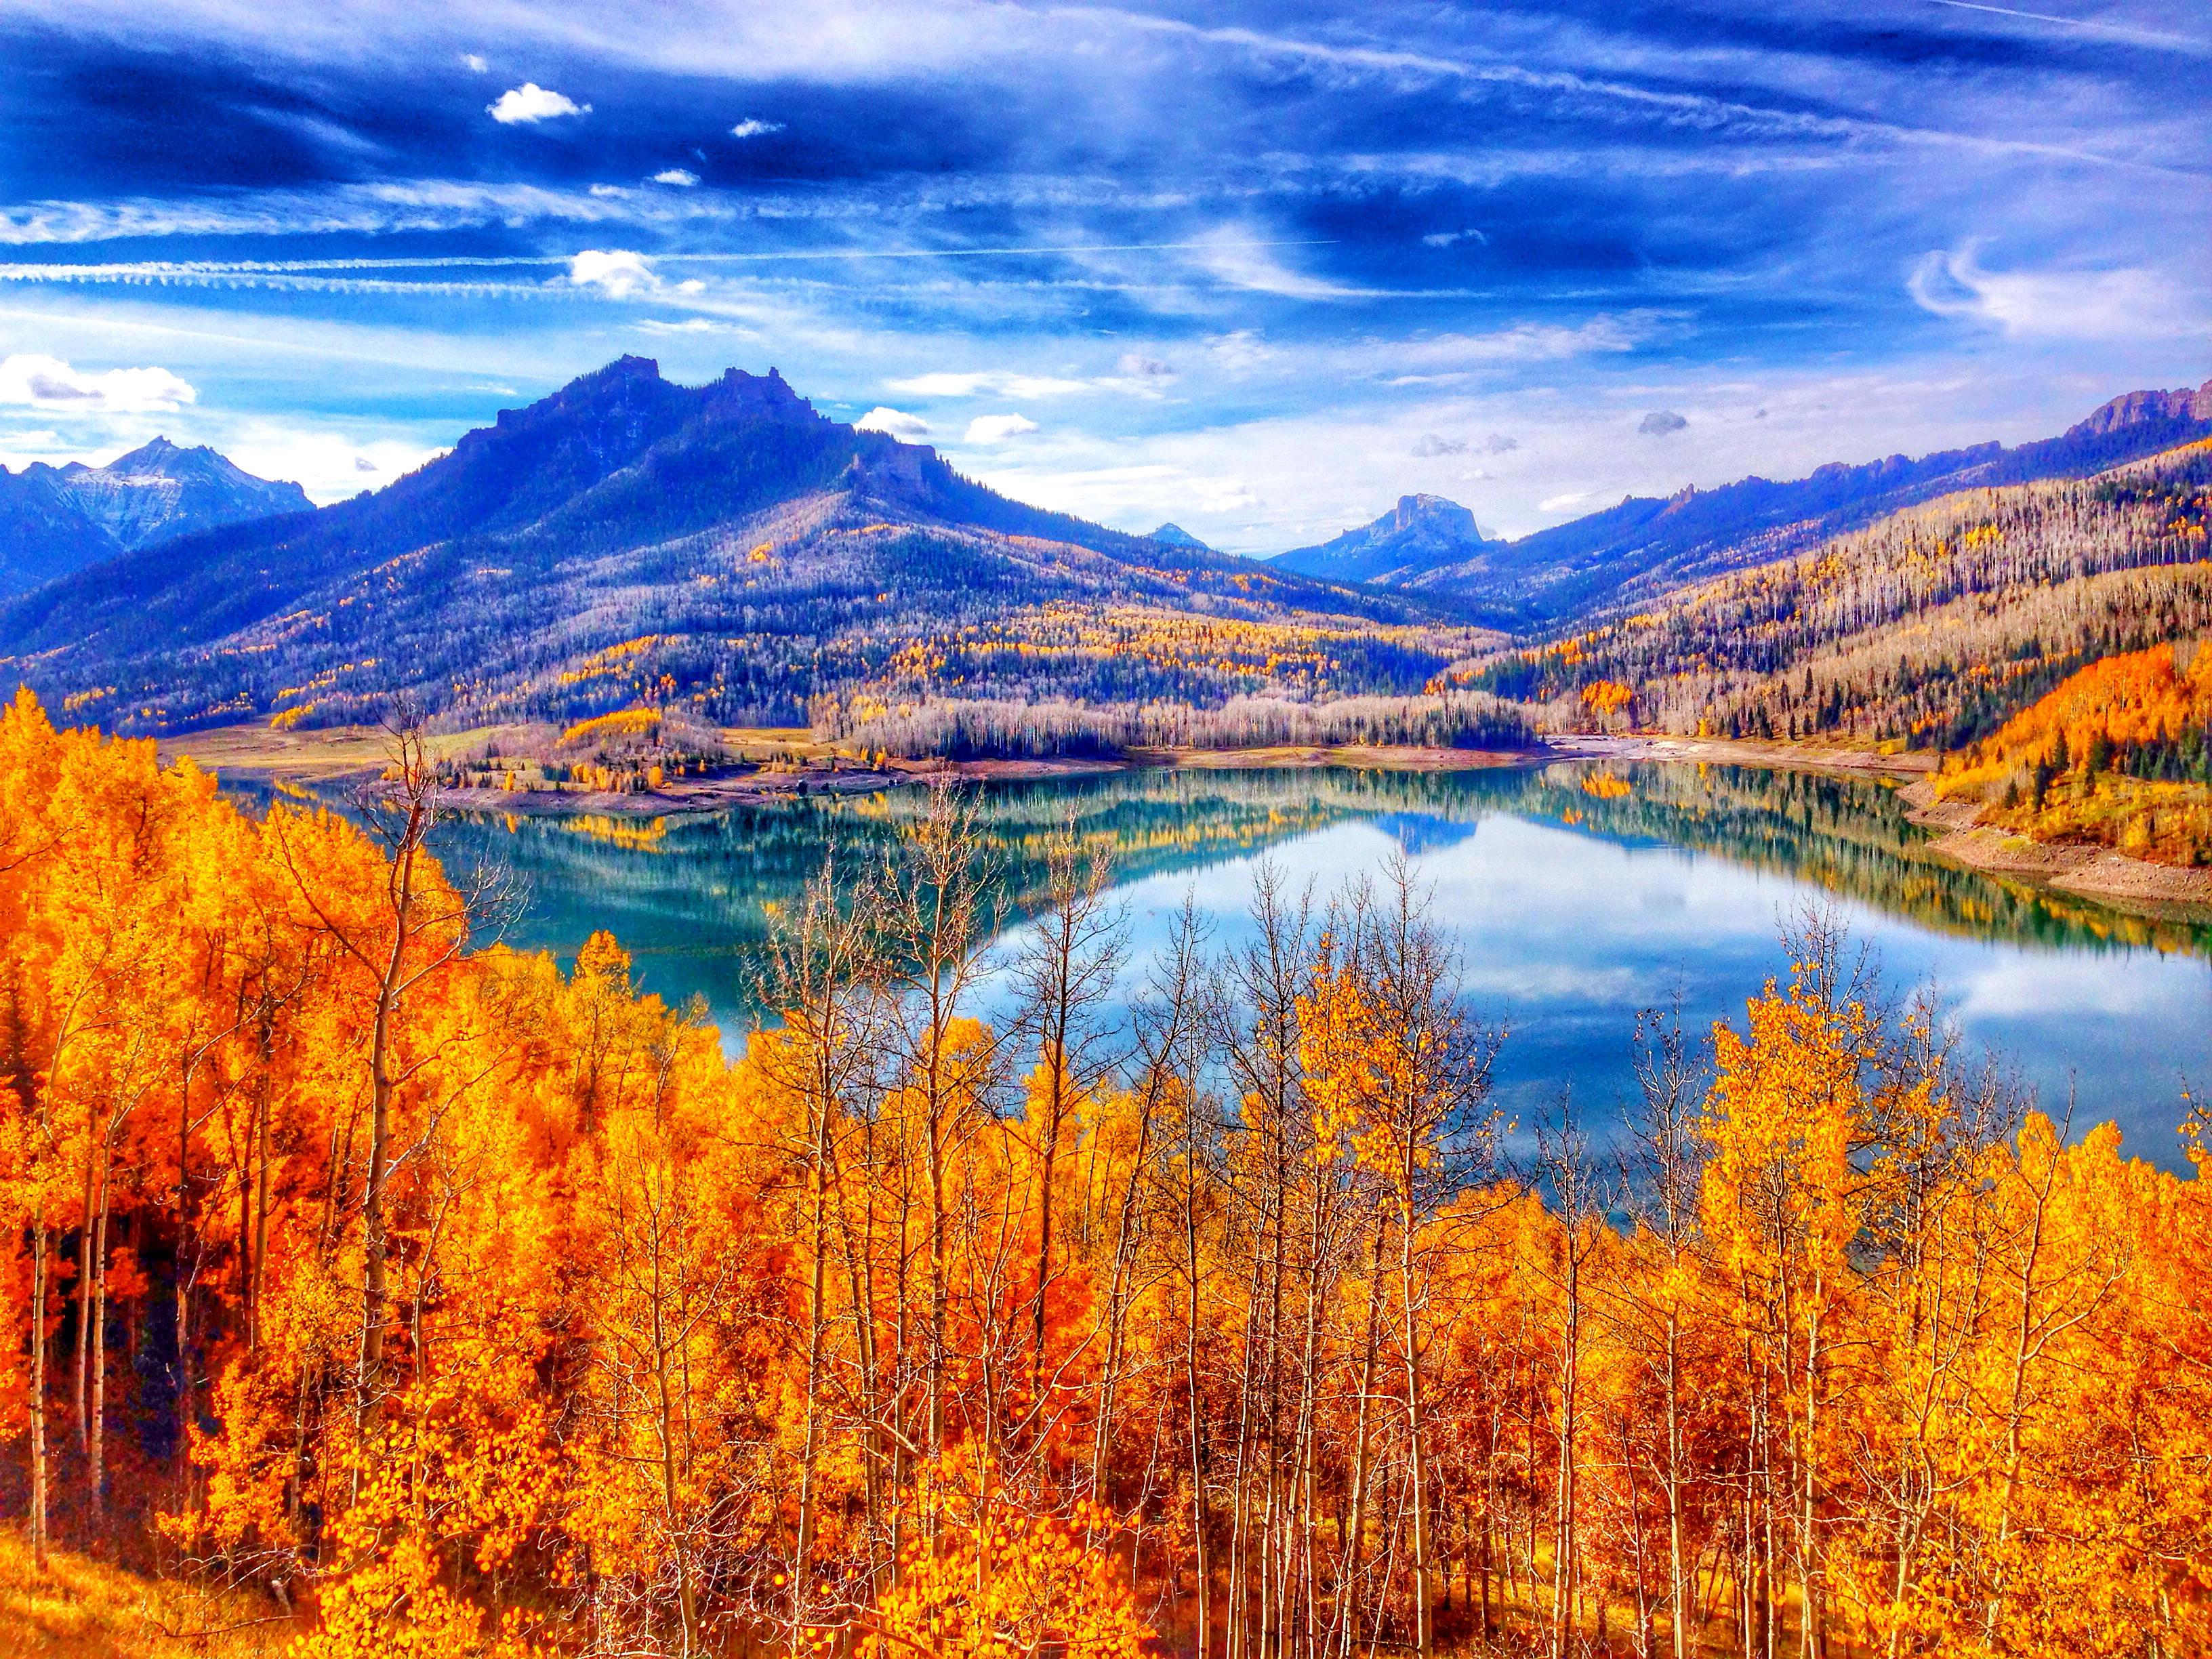 Landscape Hd Wallpaper Background Image 3264x2448 Id581600